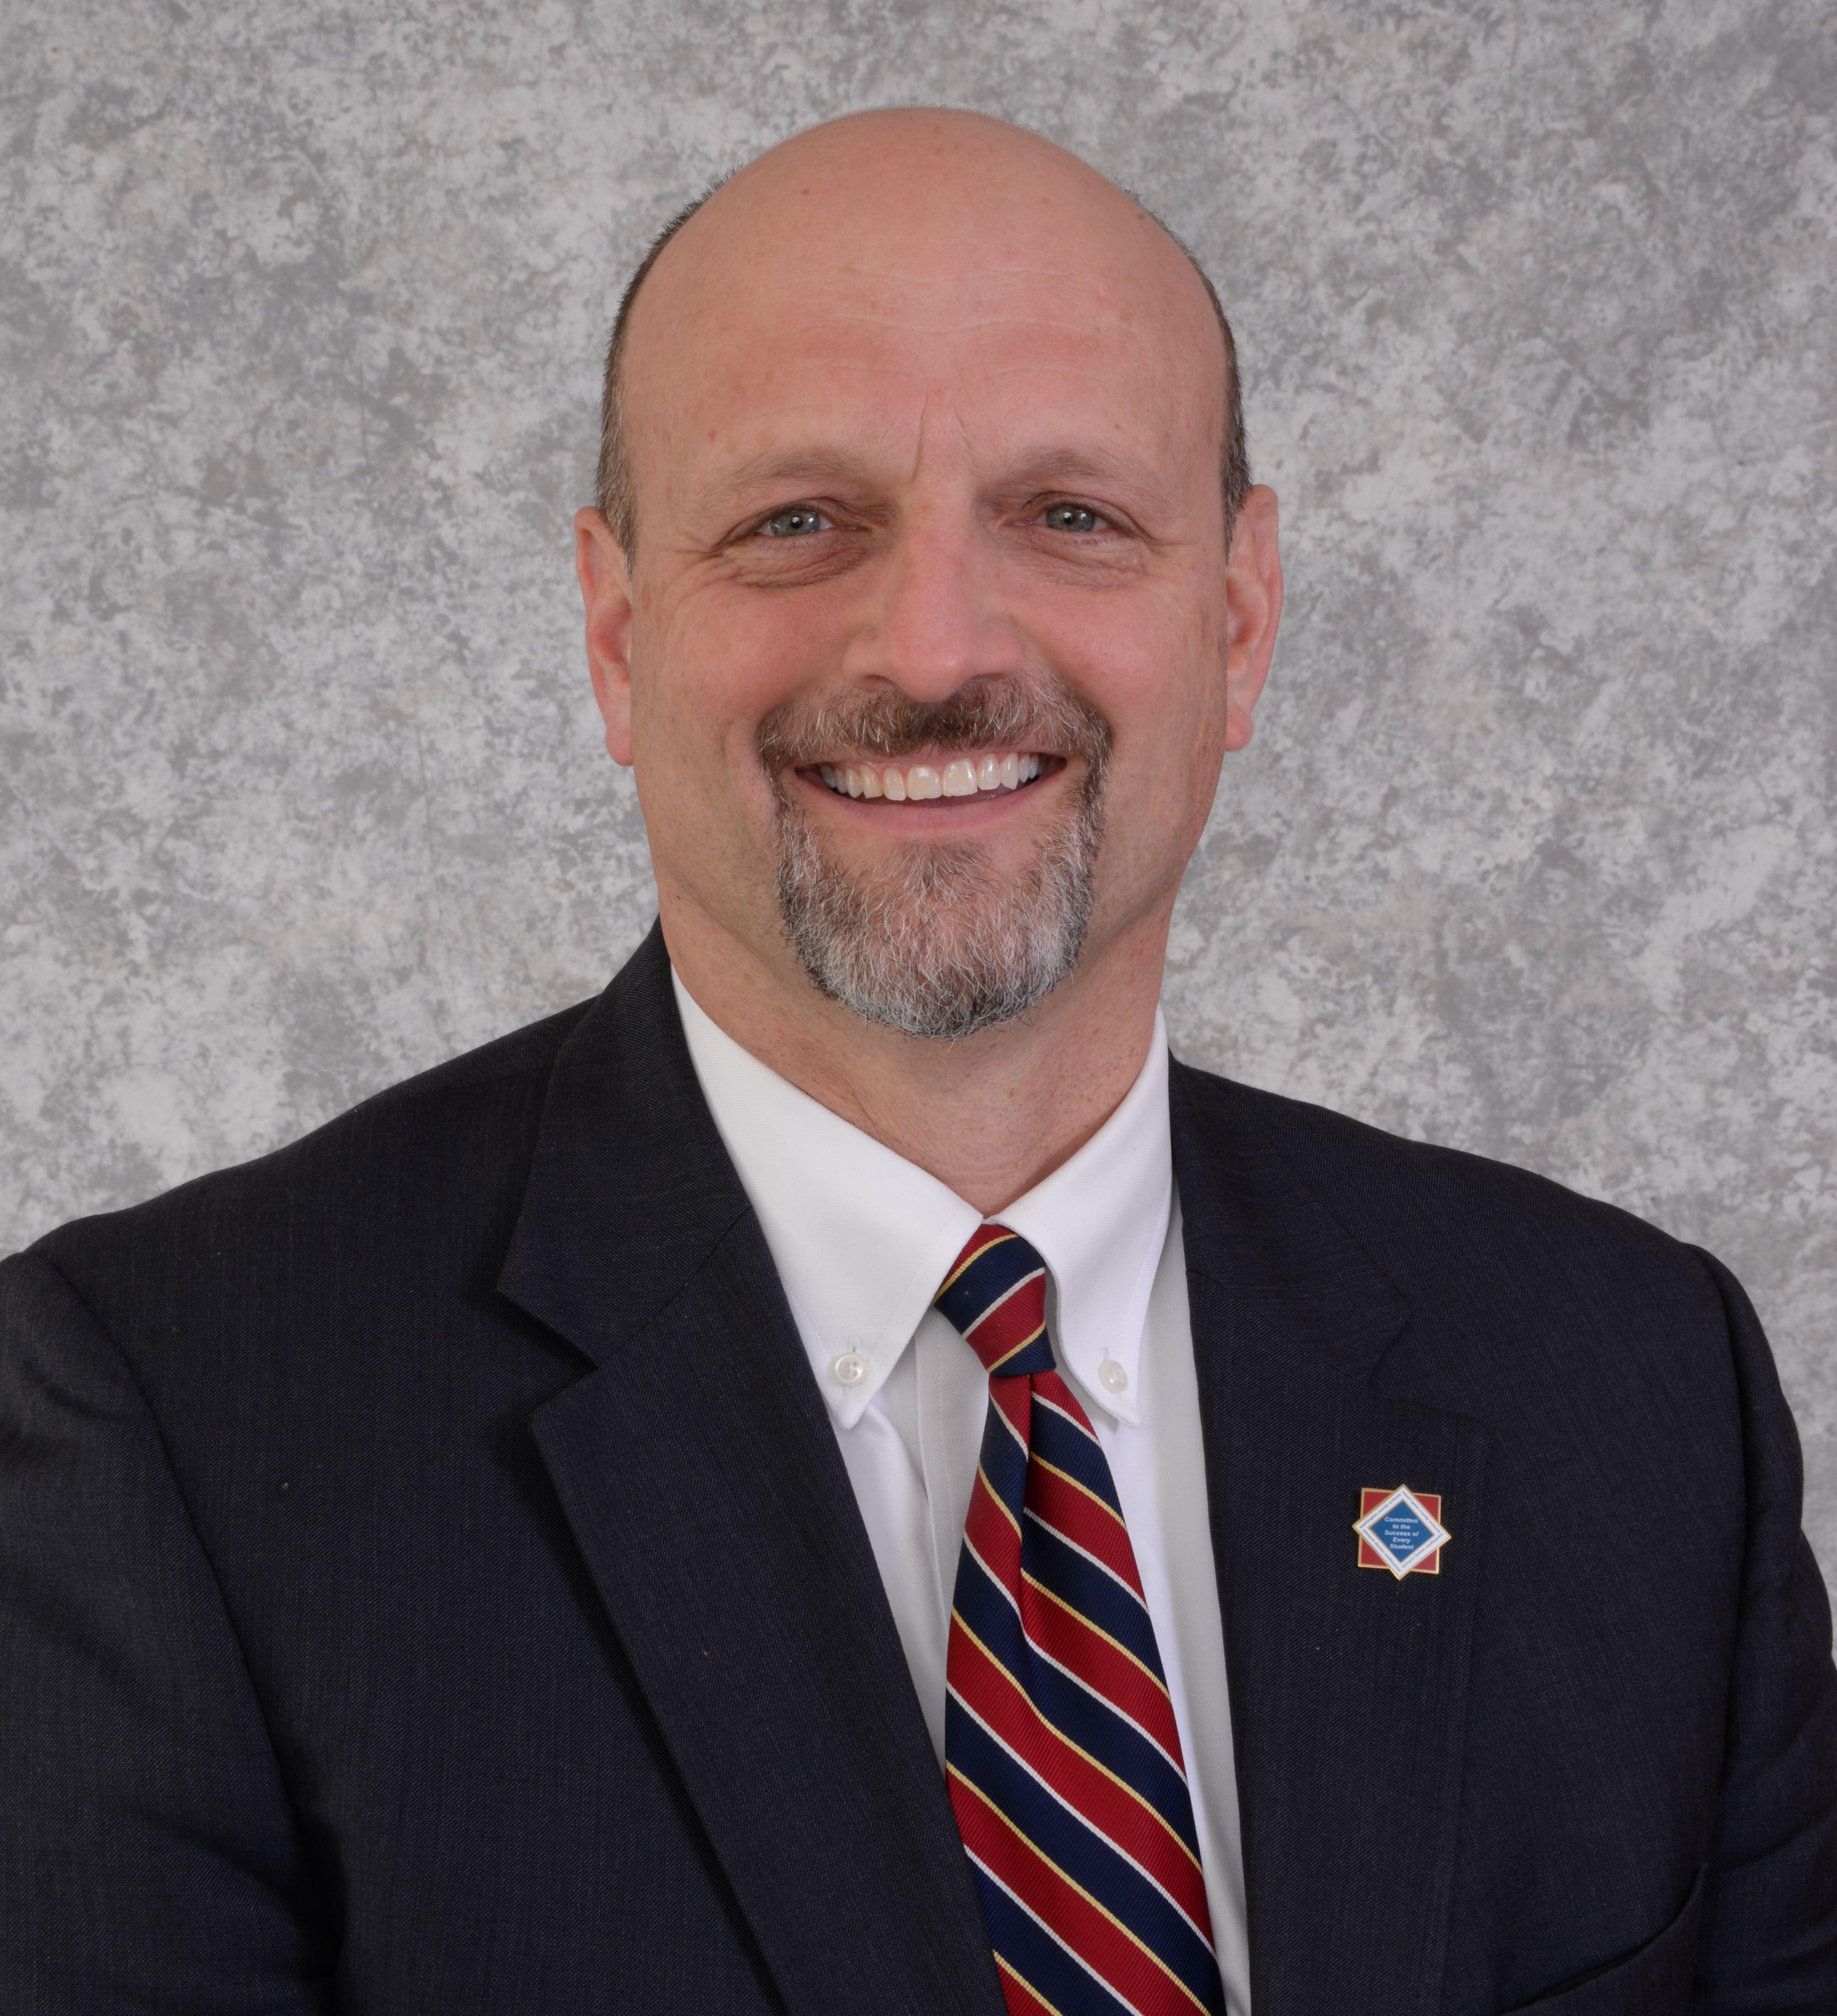 Brian Ratliff, Superintendent